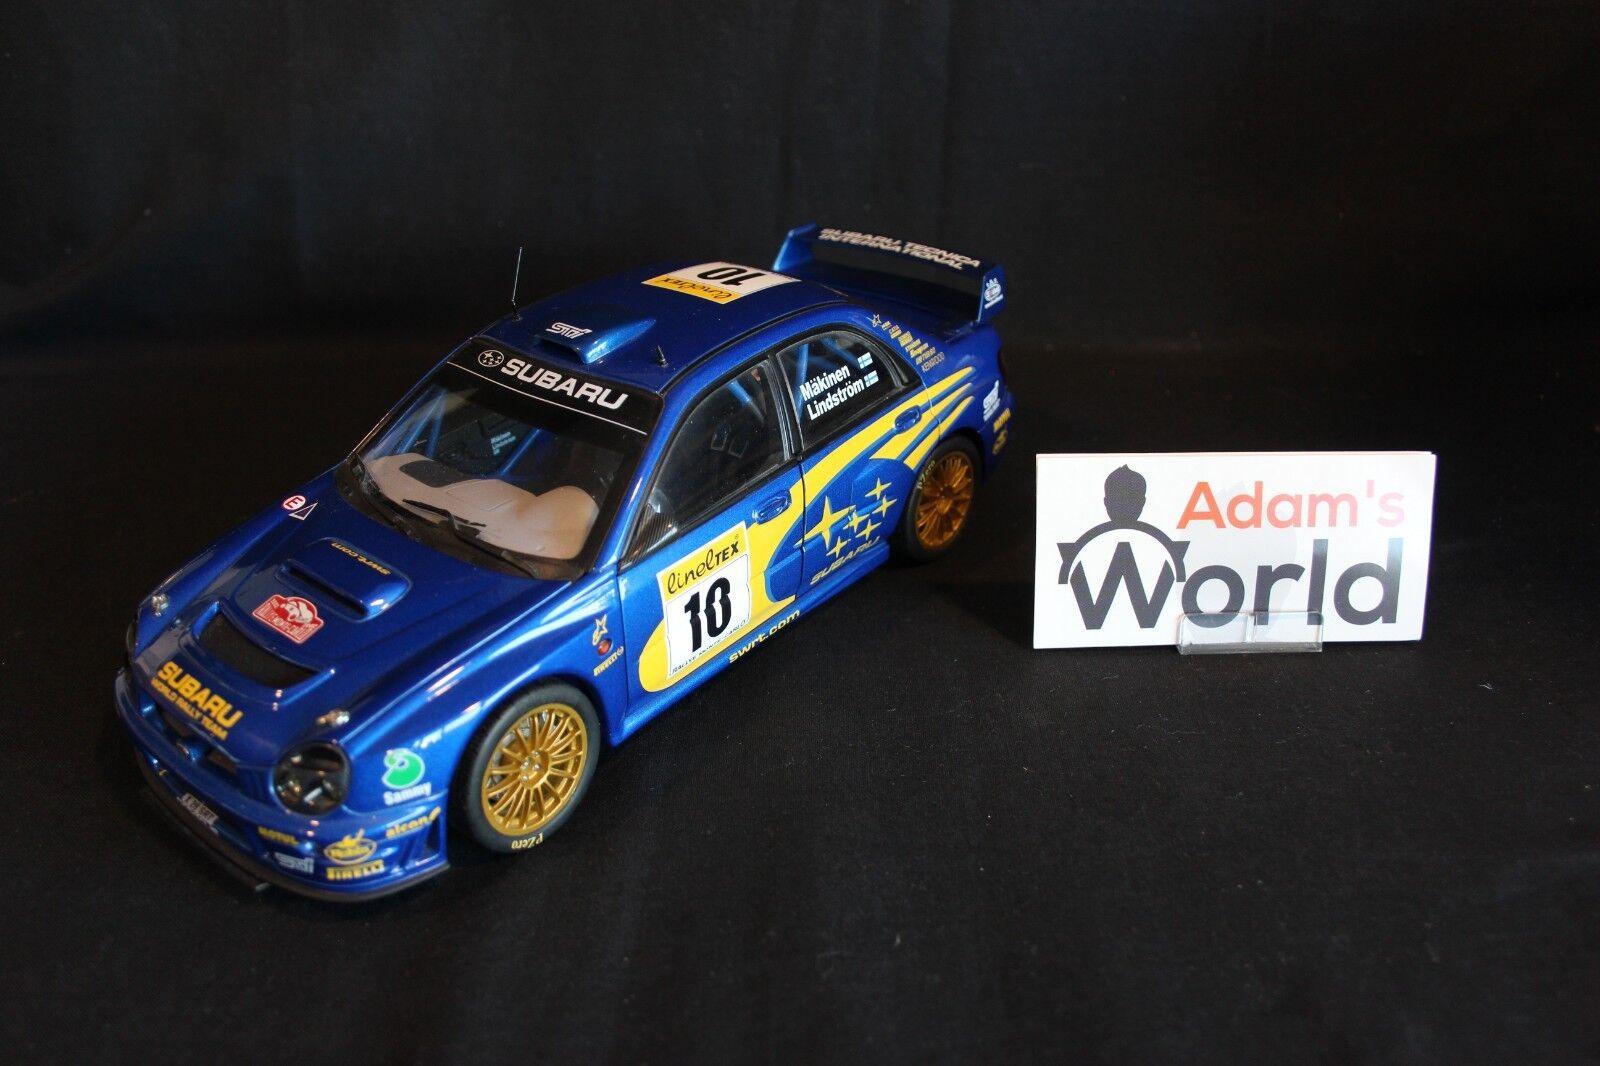 AutoArt Subaru Impreza S7 WRC '01 1 18  10 Mäkinen   Lindström winners MC (JvdM)